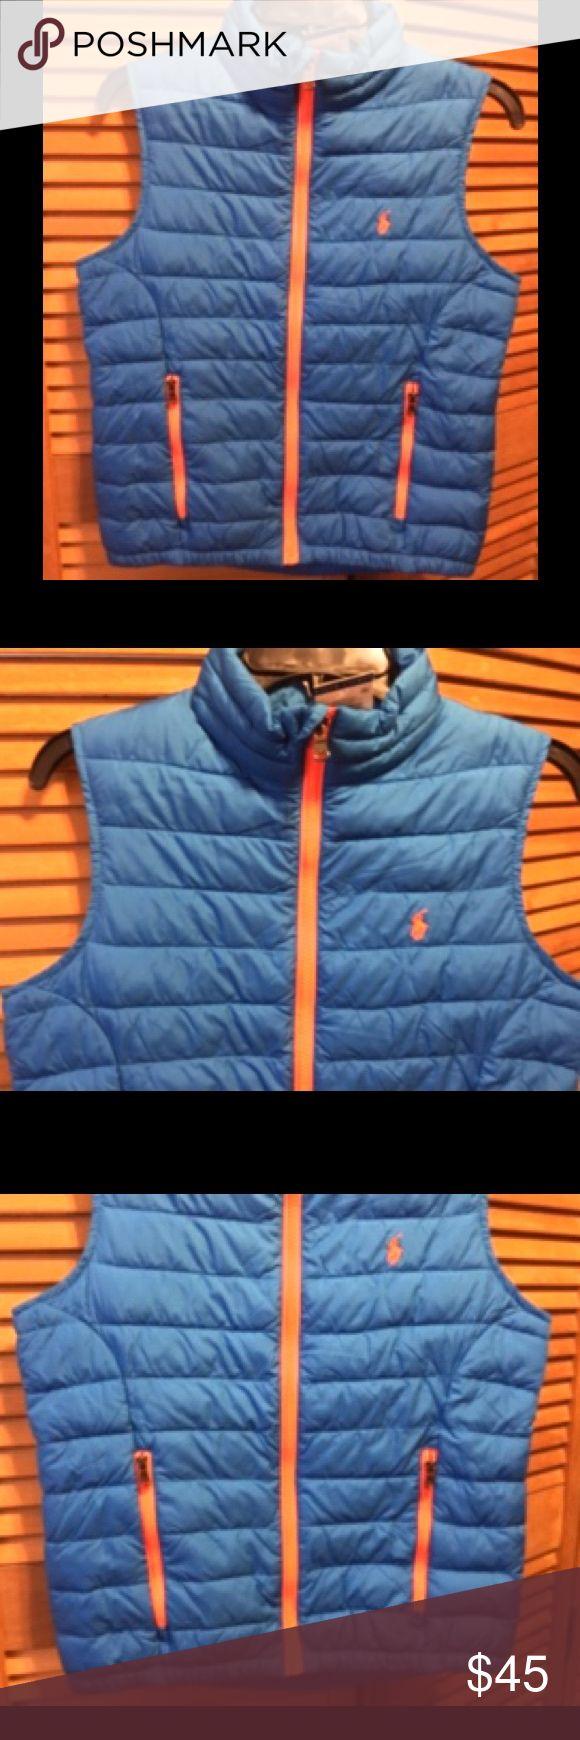 Ralph Lauren Horizon Blue Vest Horizon blur vest with fluorescent orange zippers and pony logo. Youth medium (10-12). 100% polyester Lining 100% nylon Filling 100% polyester. NWT (new with tag). Ralph Lauren Jackets & Coats Vests